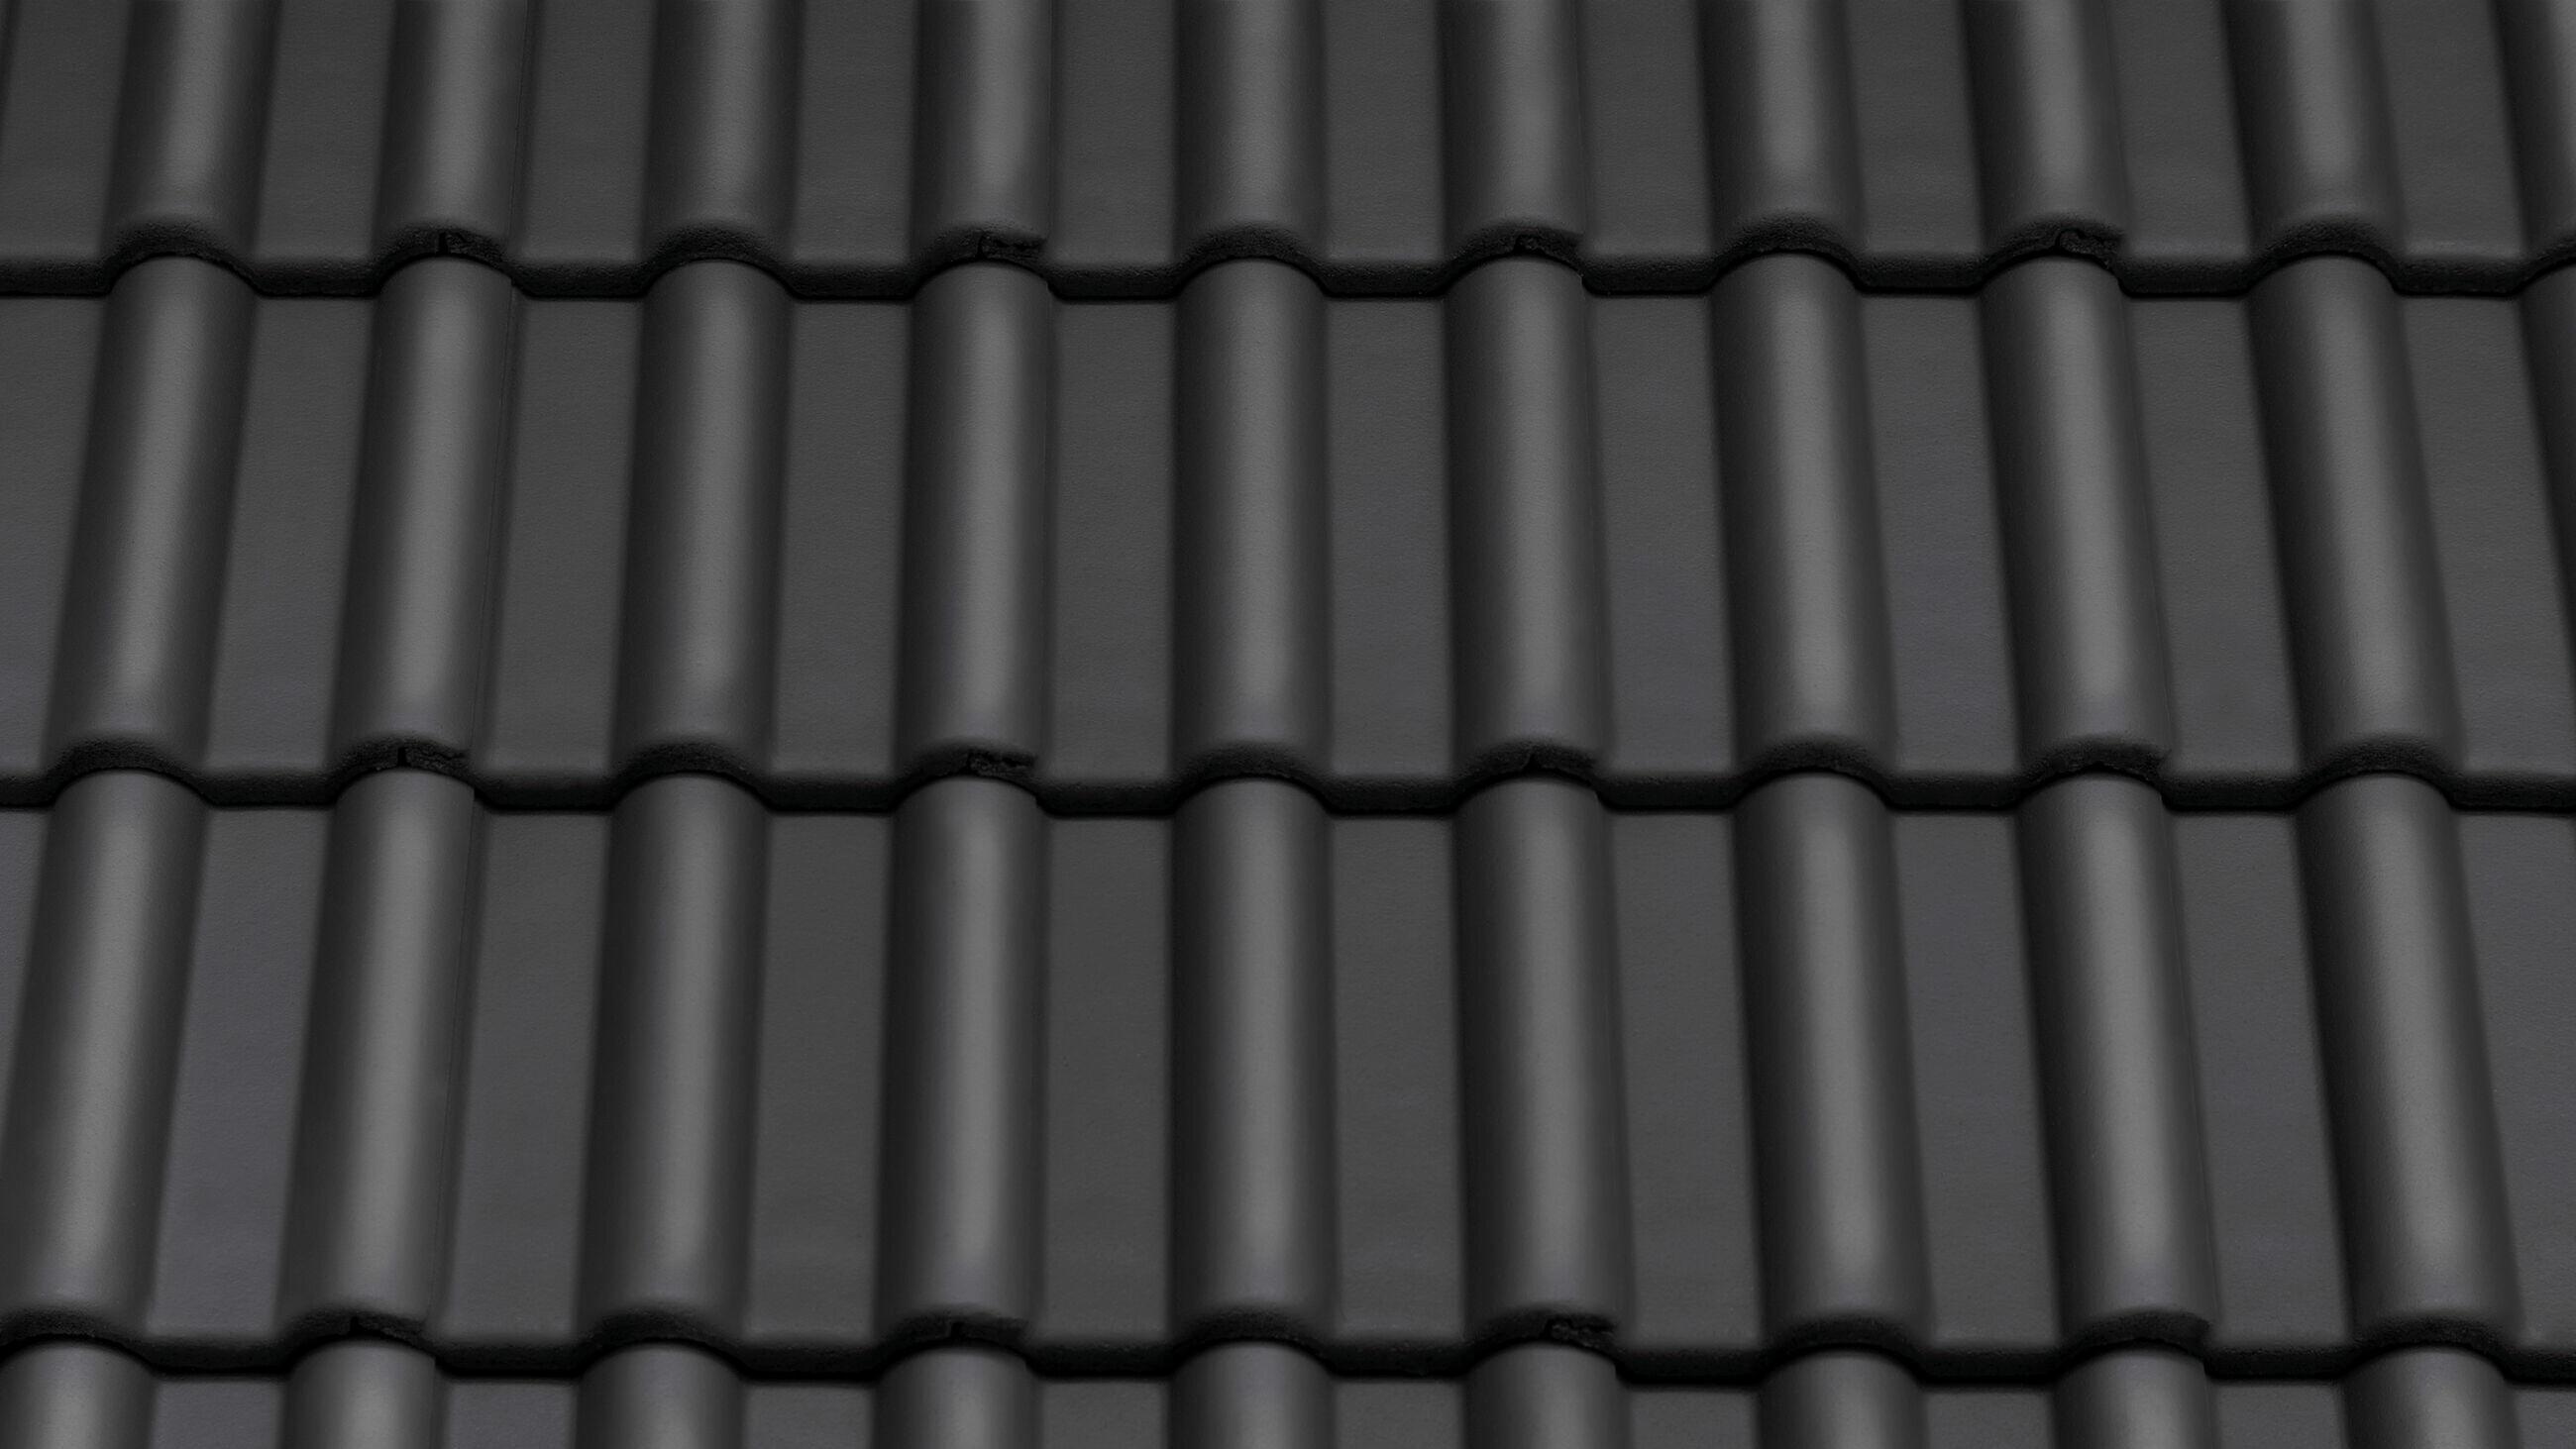 HEIDELBERG planar dark grey